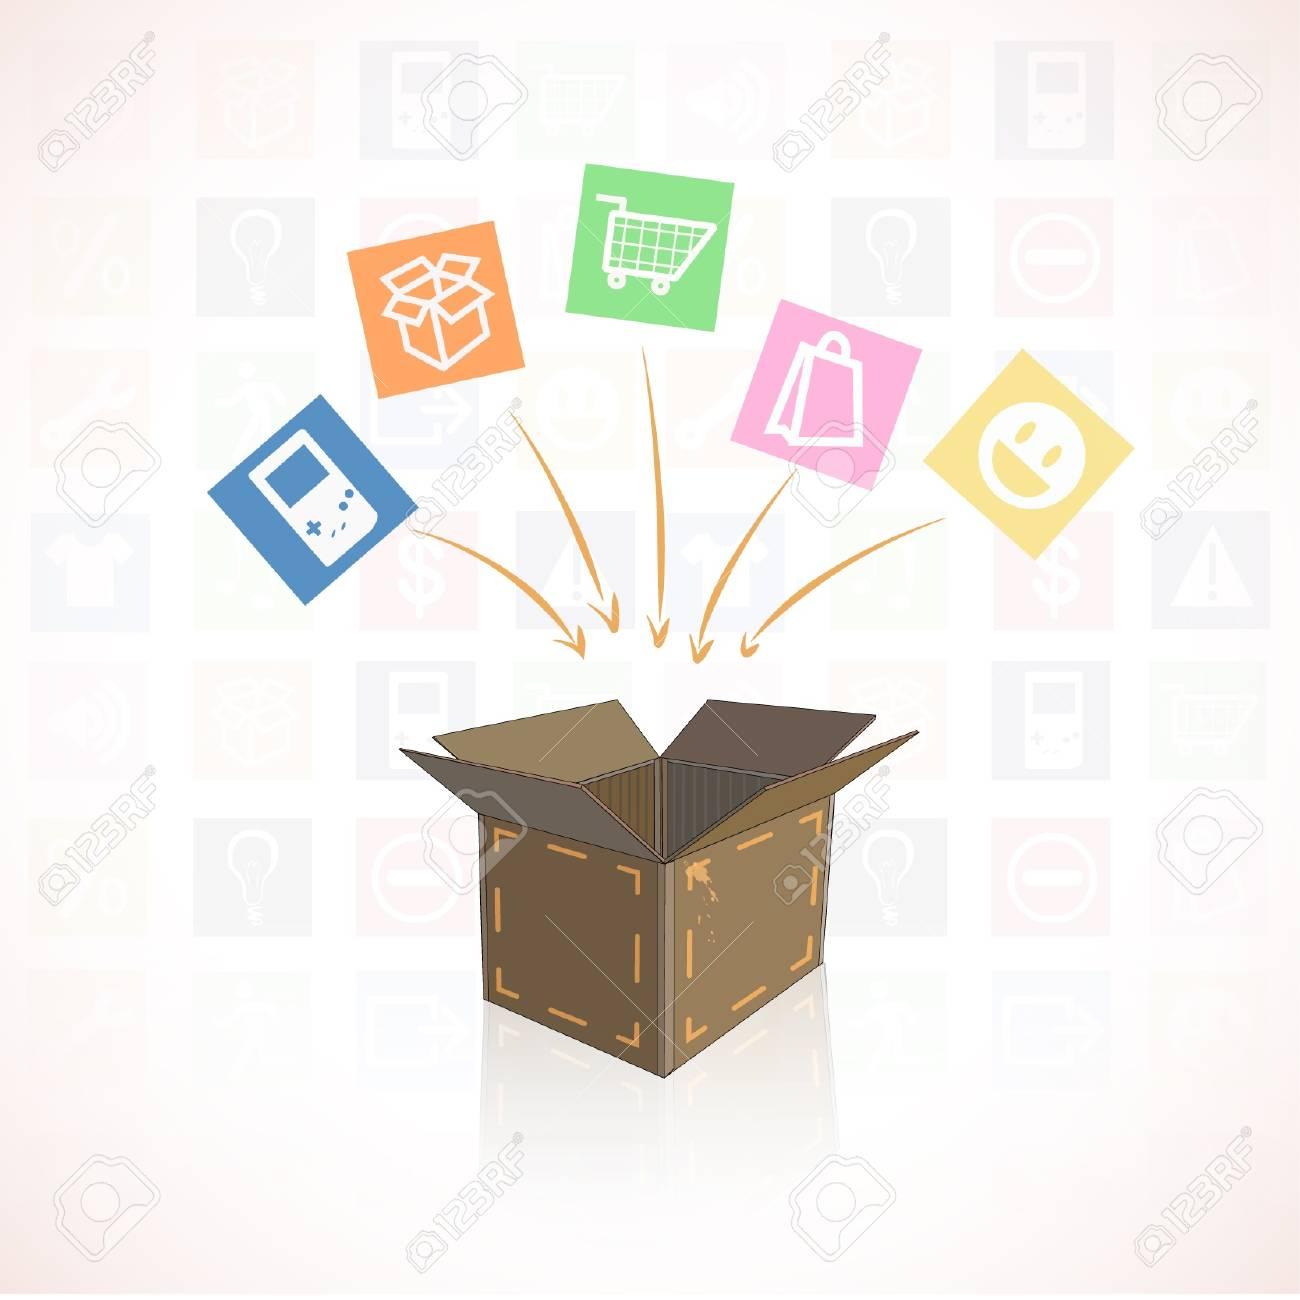 Box shopping of shopping center ready to send   illustration Stock Vector - 17344281